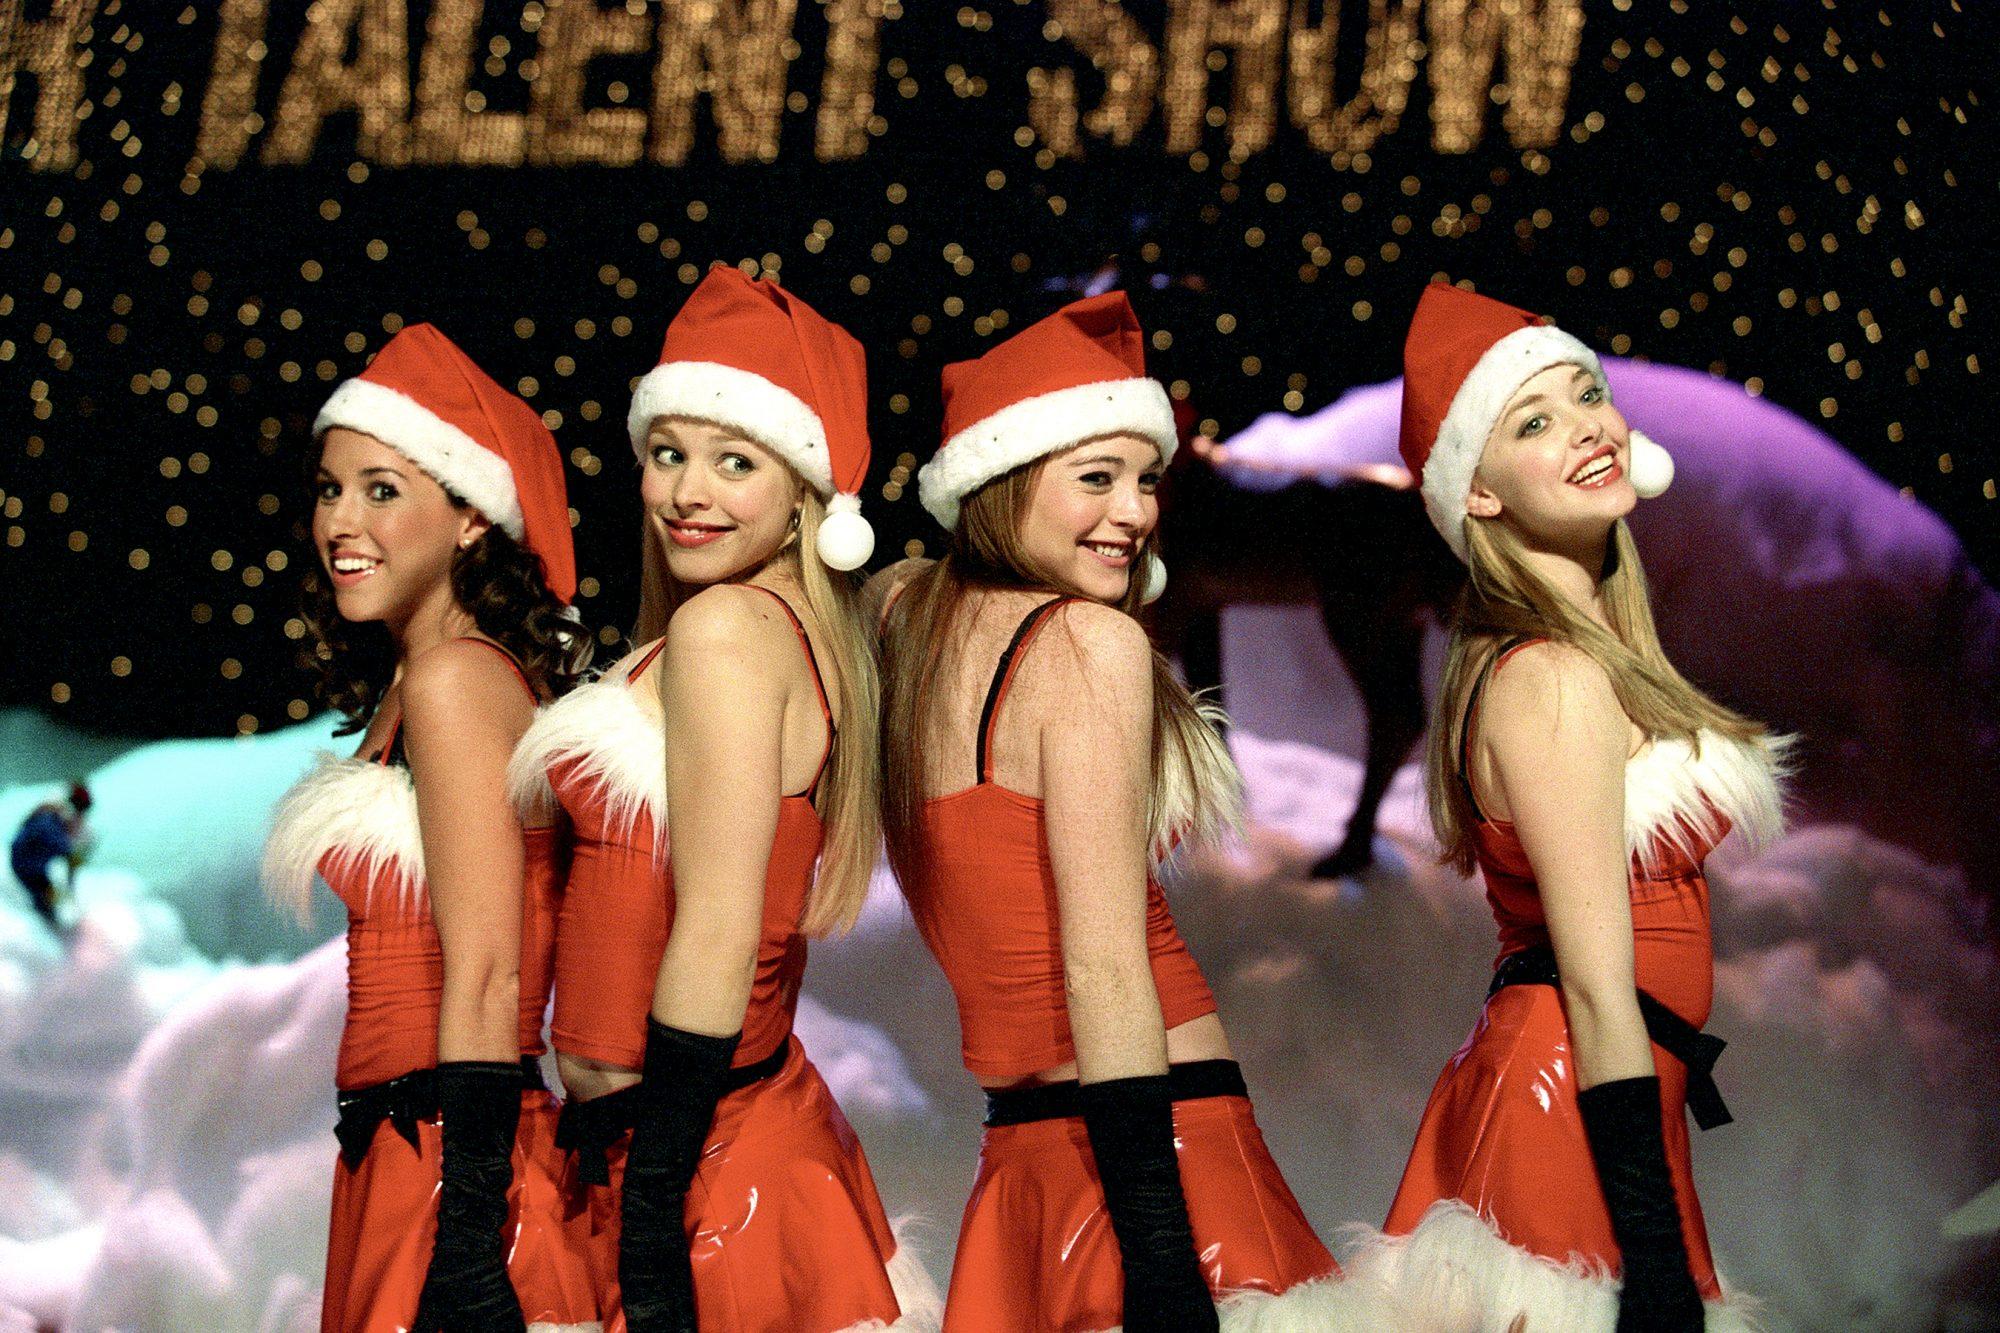 MEAN GIRLS, Lacey Chabert, Rachel McAdams, Lindsay Lohan, Amanda Seyfried, 2004, (c) Paramount/court